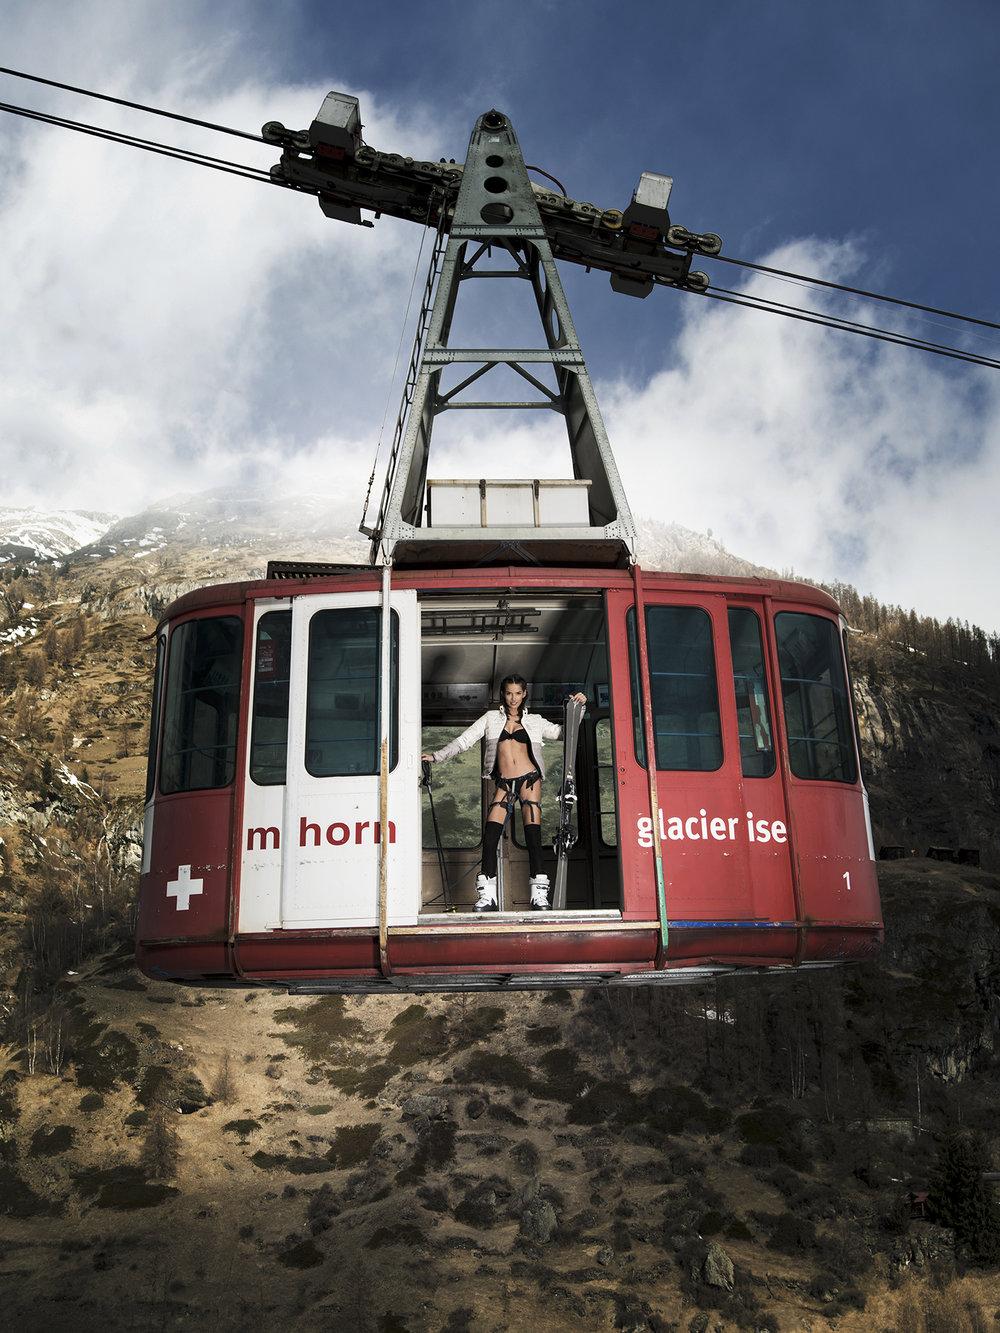 Andjela Milanovic, unser Schweizer Topmodel in der Pendelbahn Zermatt Bergbahnen.